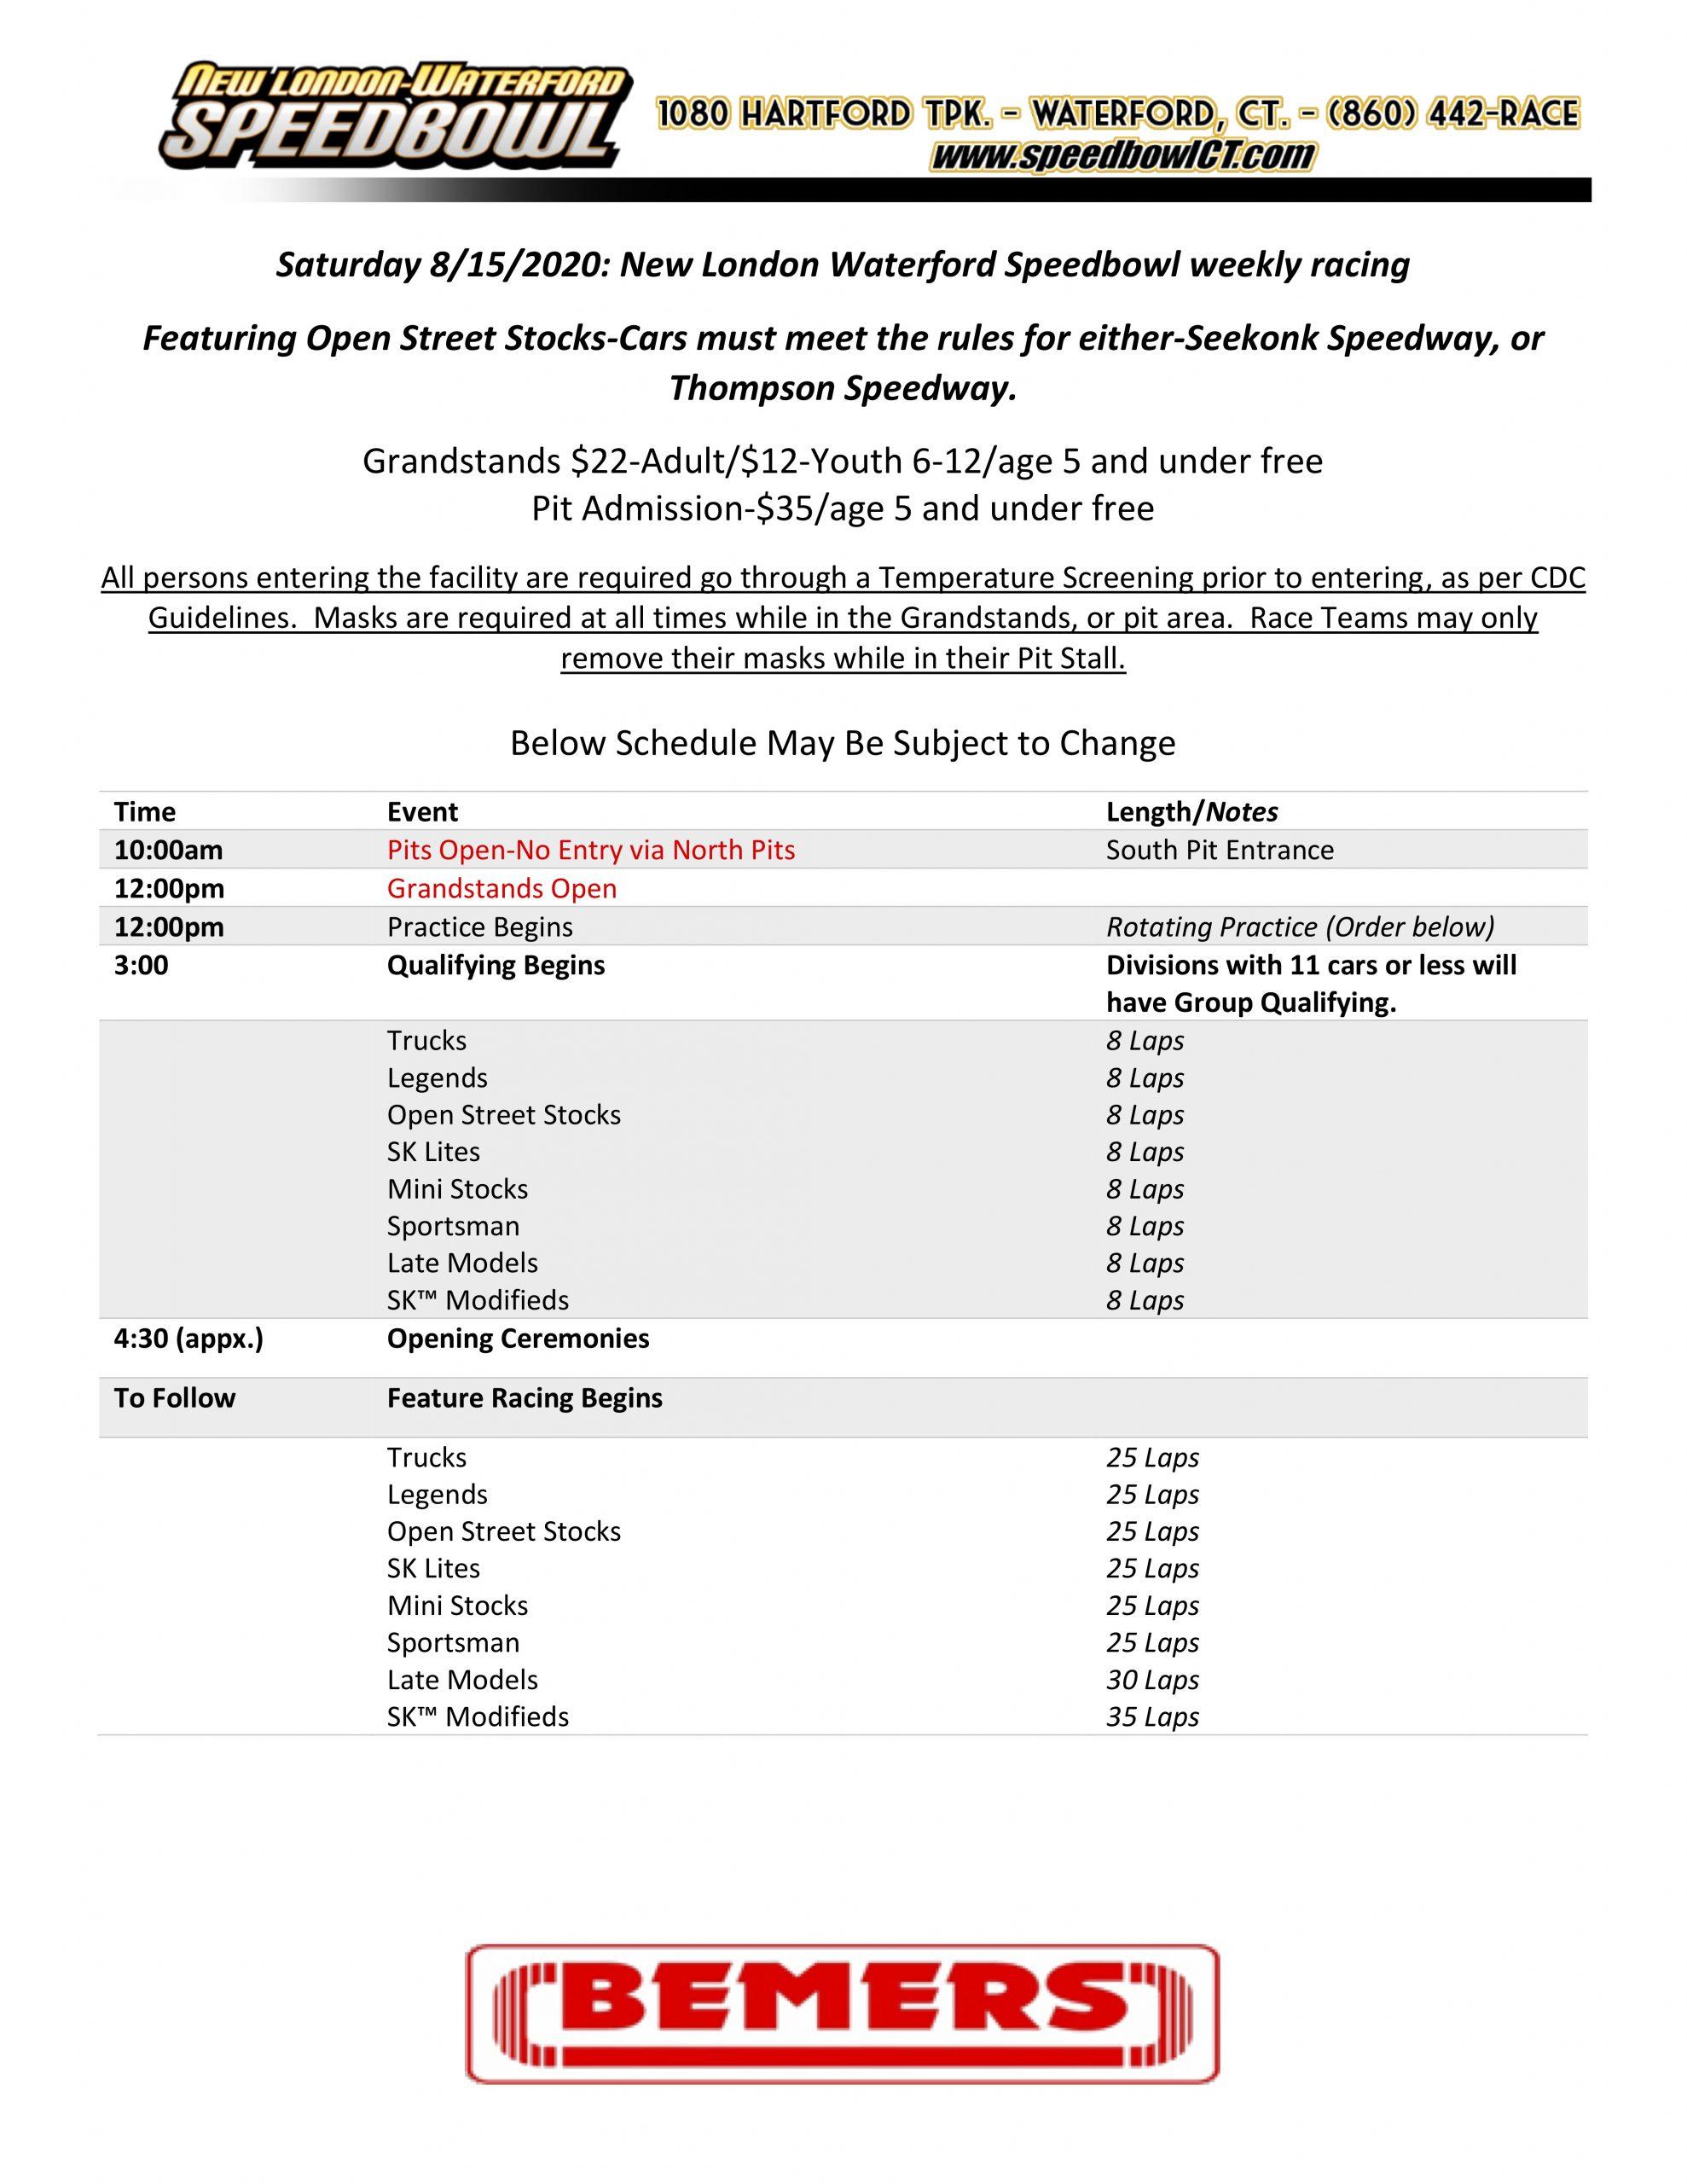 Saturday Night Race Schedule